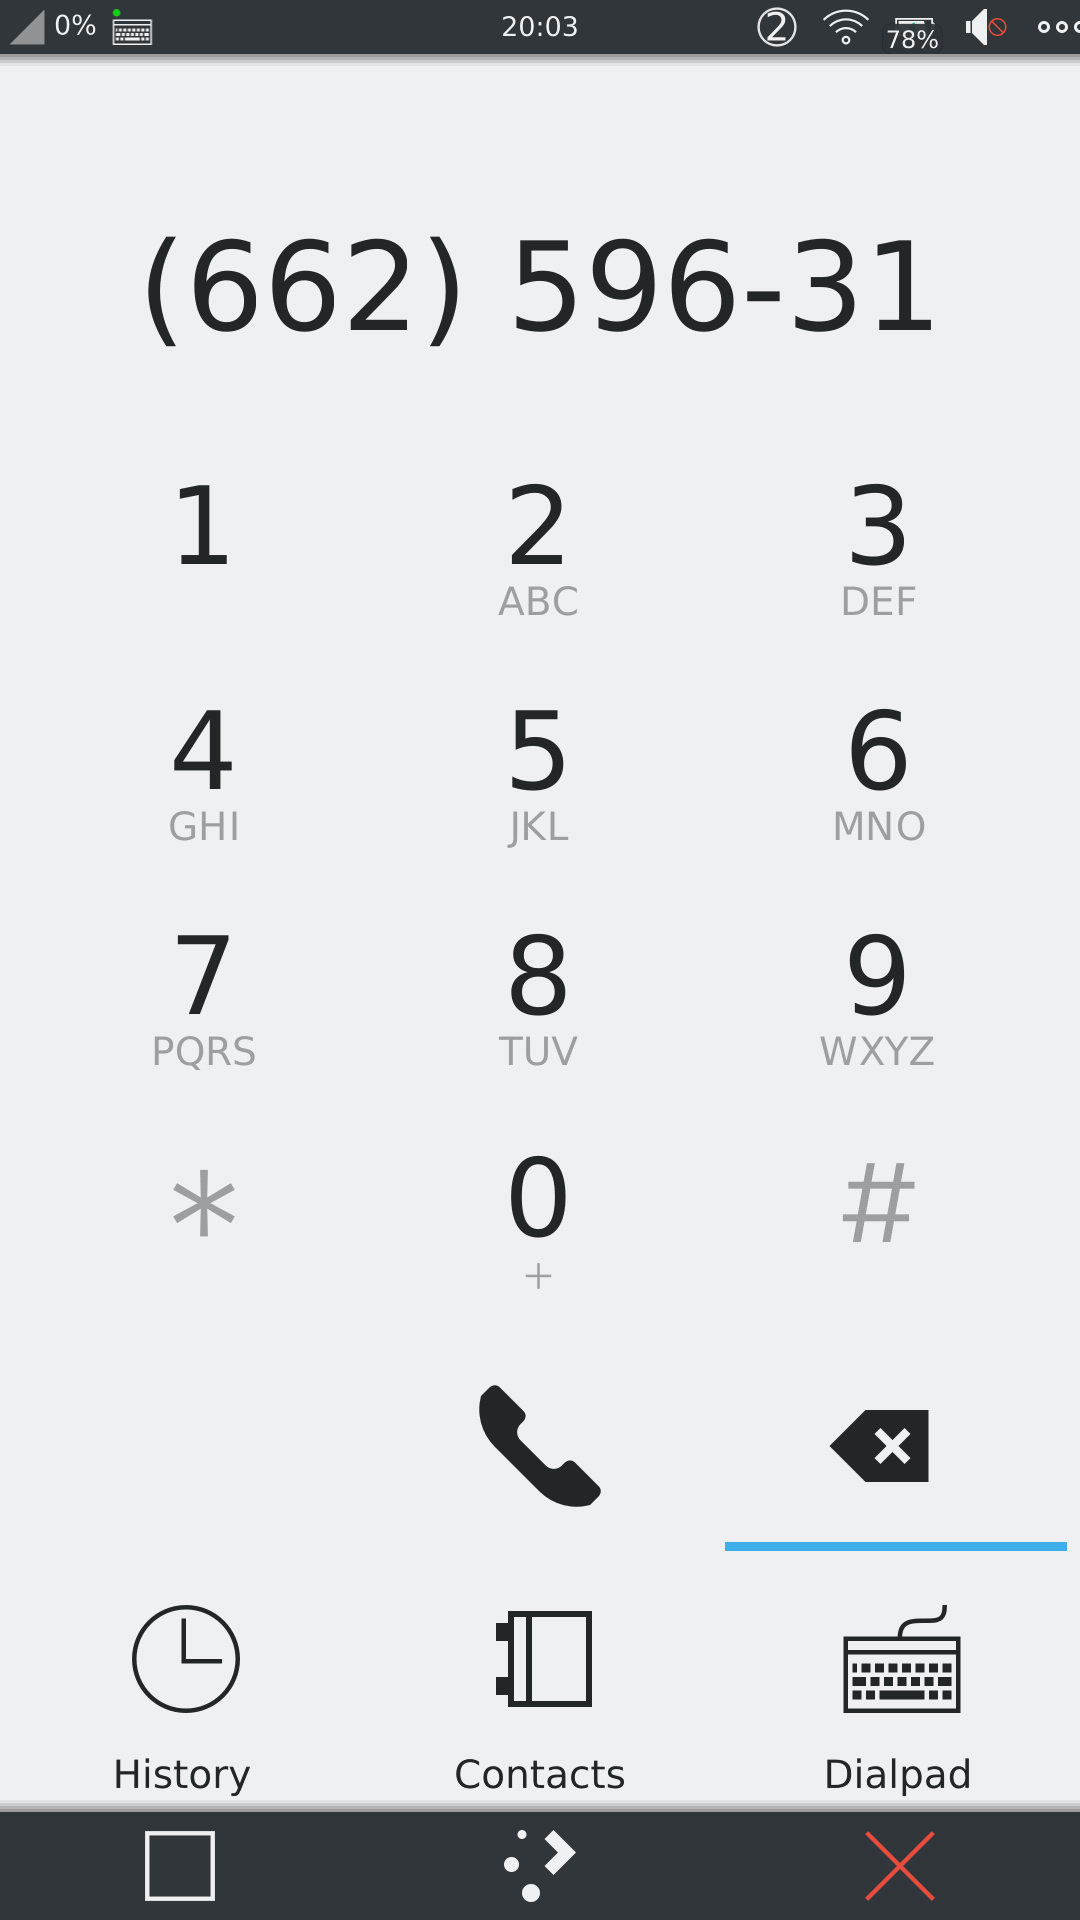 img/screenshots/dialer.png